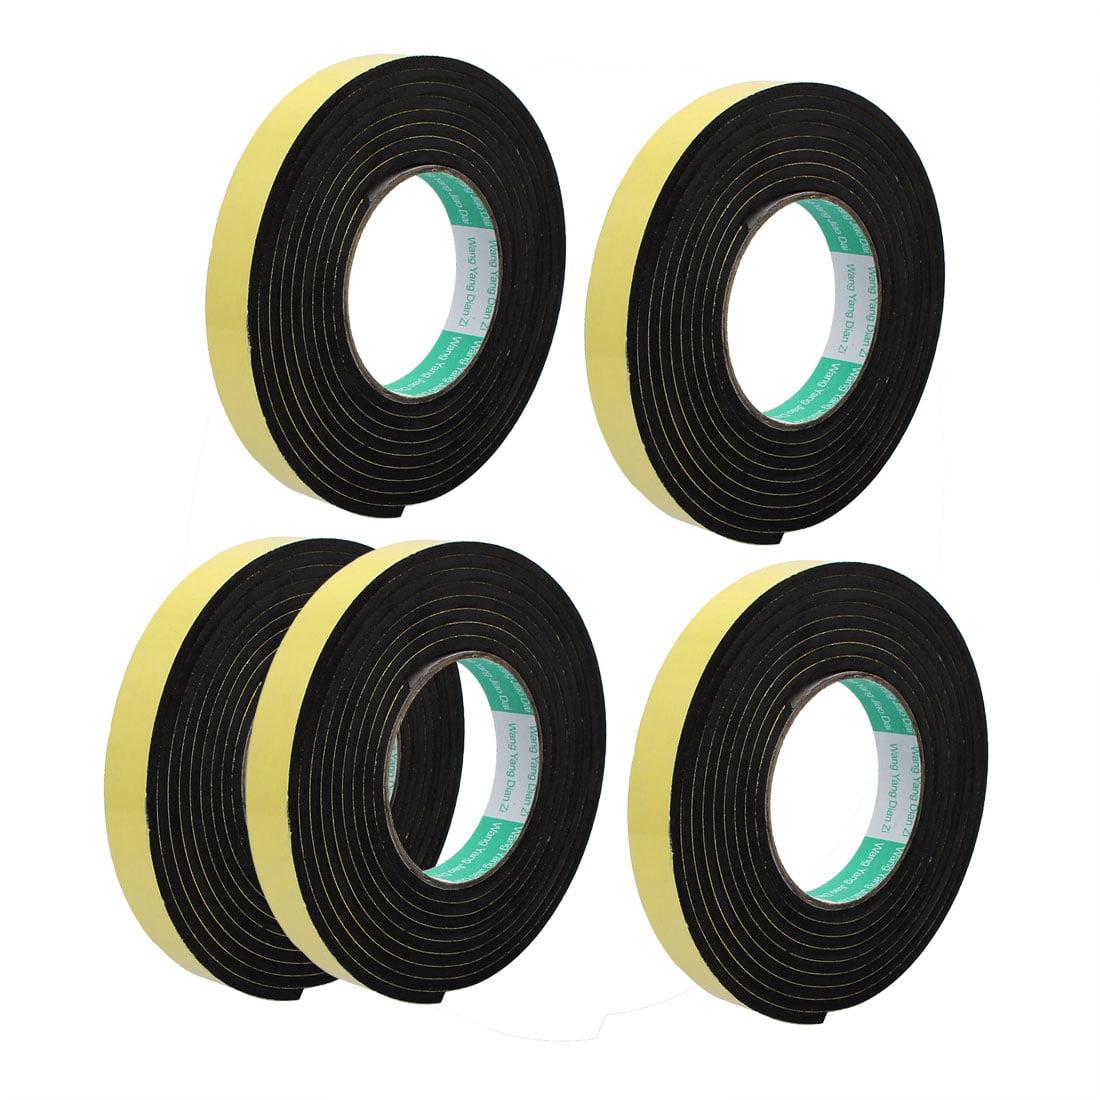 5pcs 3 Meter 20mm x 4mm Single-side Adhesive Shockproof Sponge Tape Yellow Black